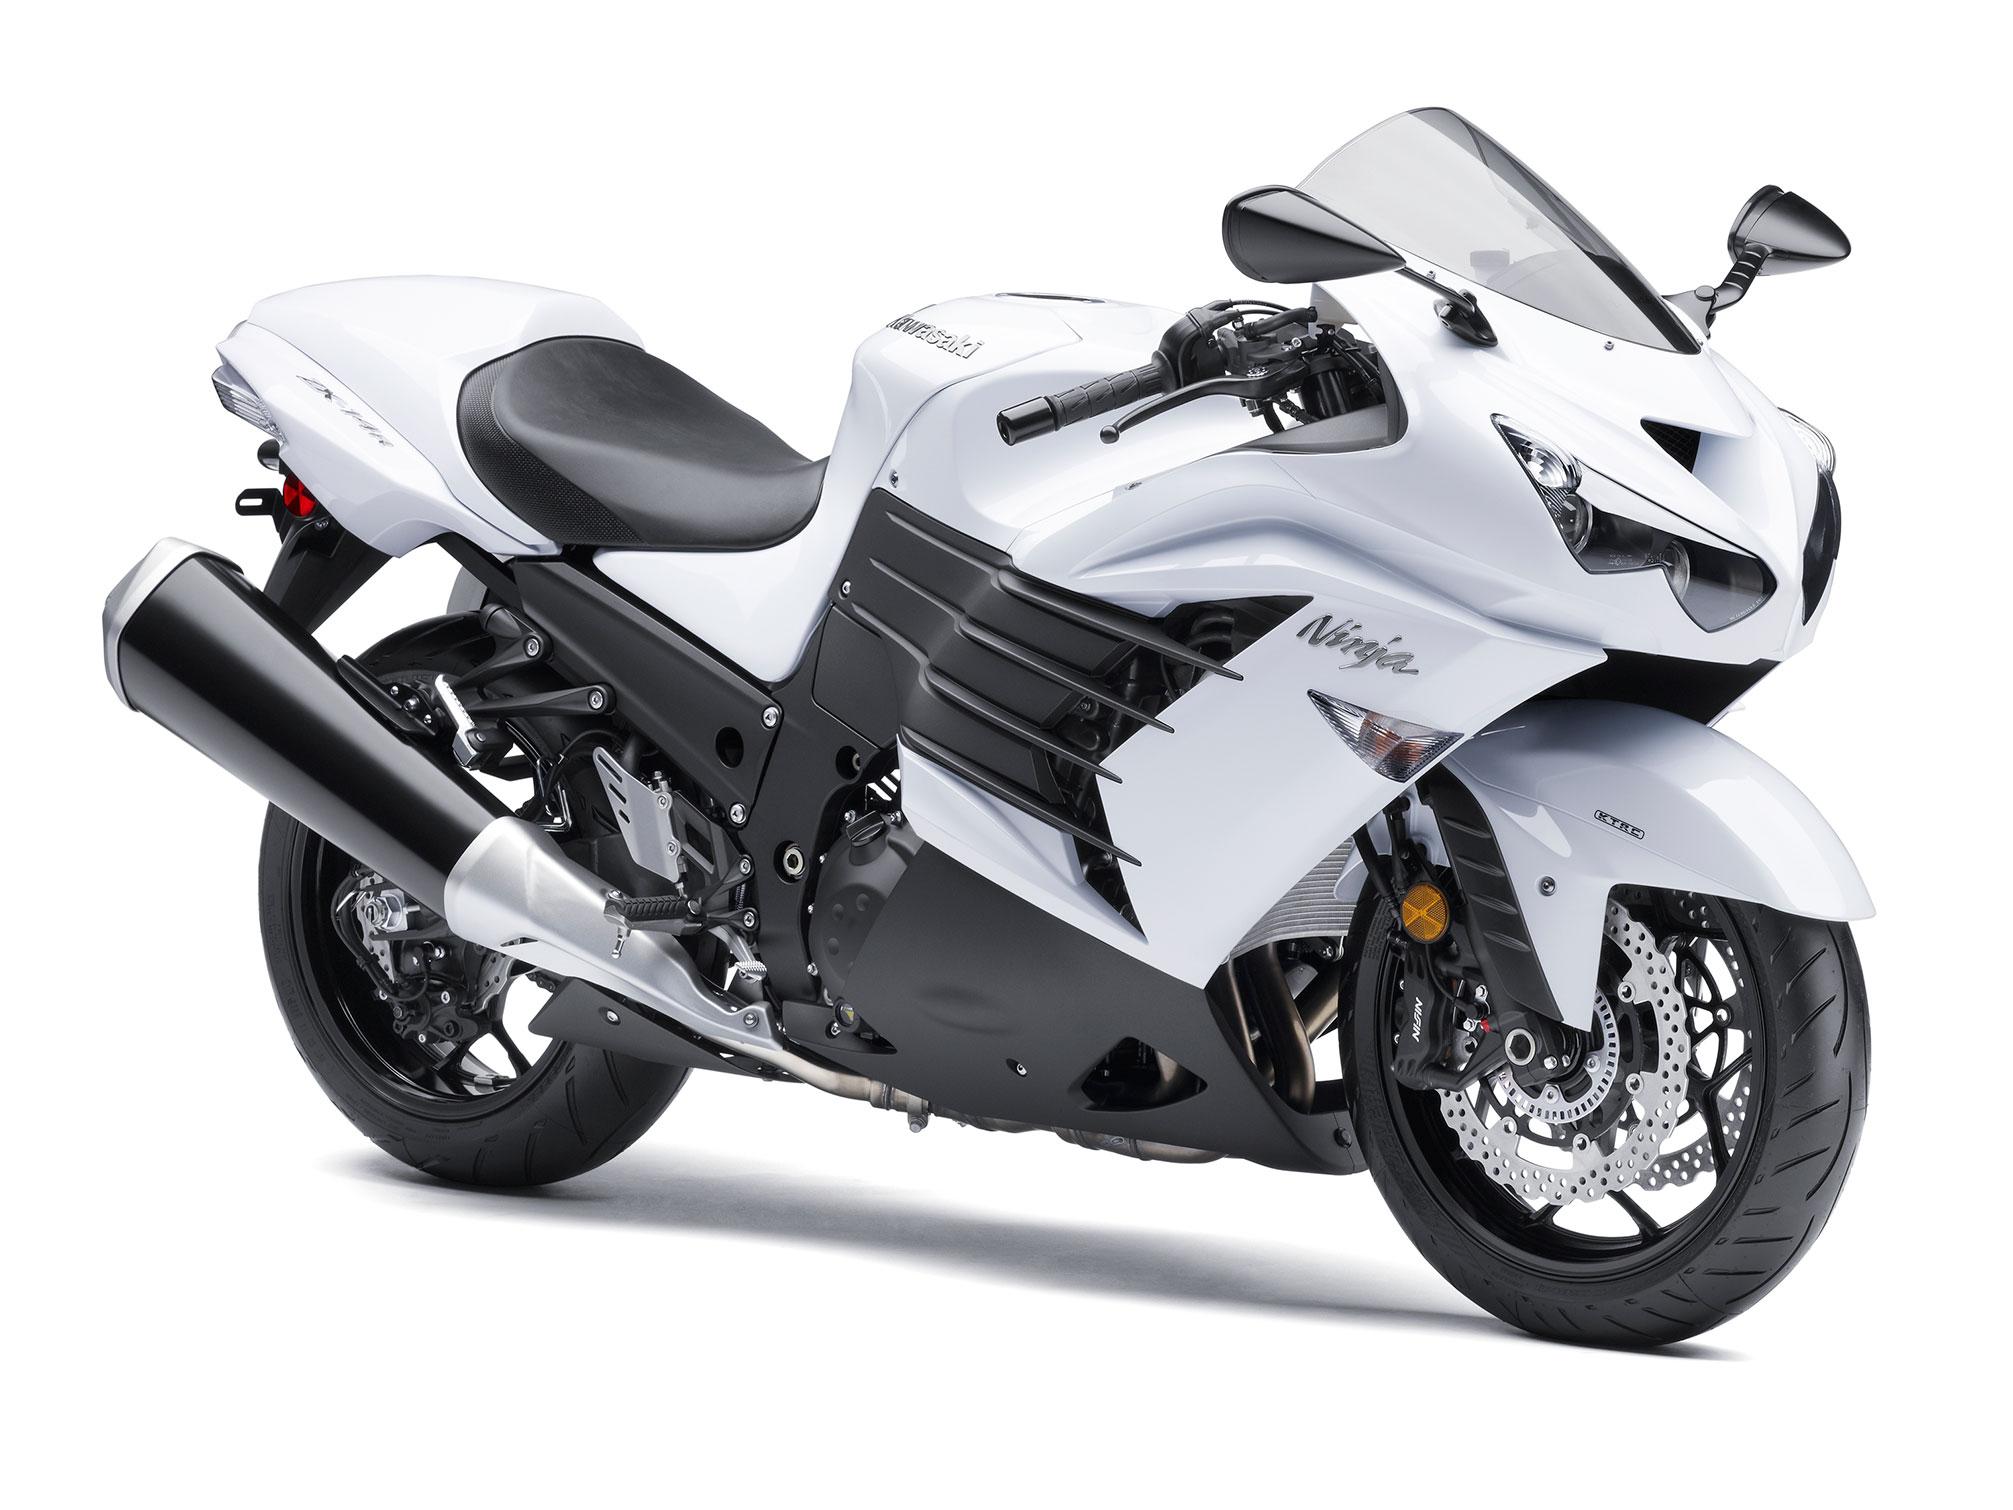 Kawasaki Ninja Zx14 Reviews Price Specifications Mileage